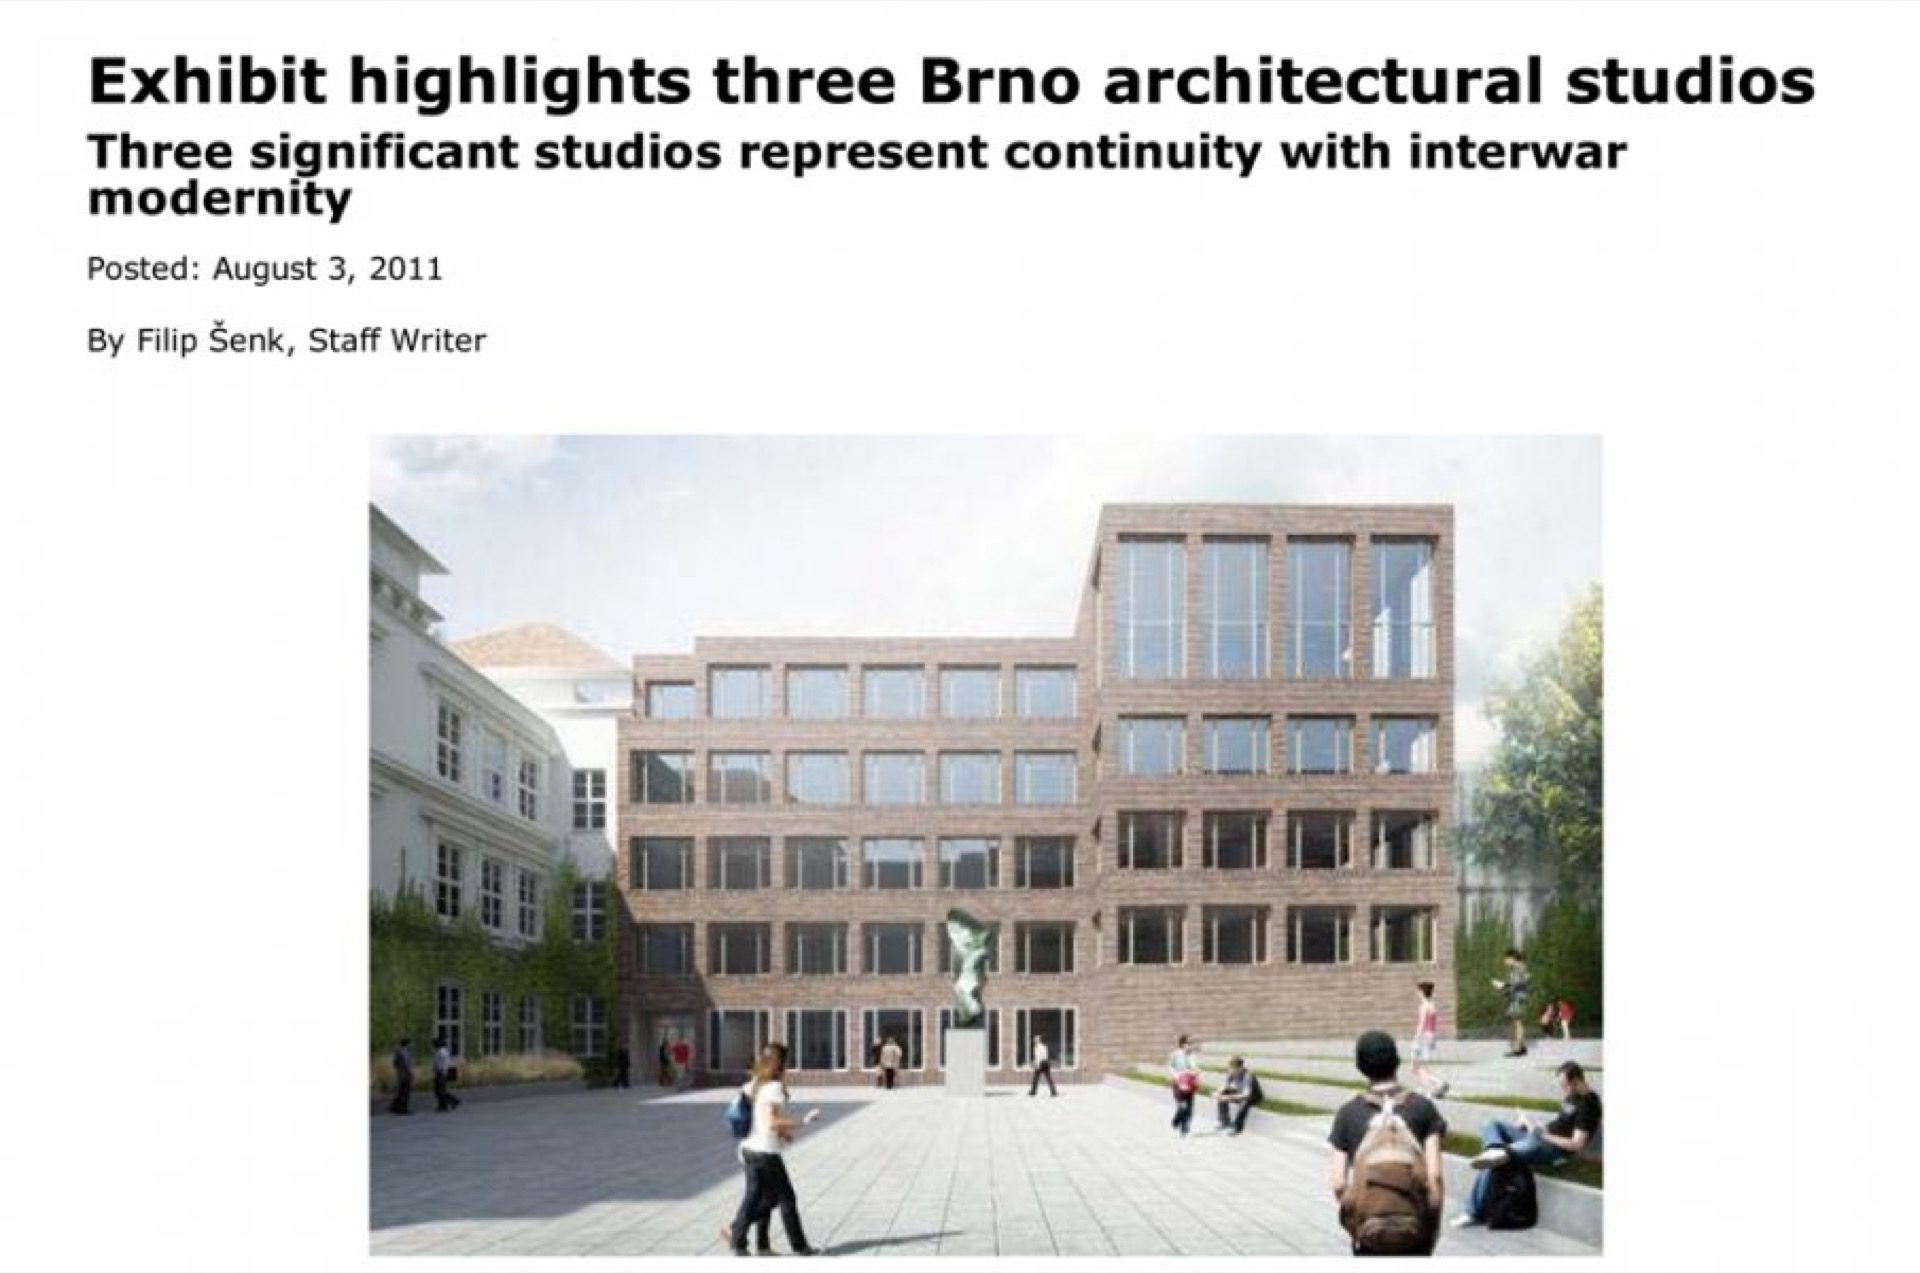 Exhibit highlights three Brno architectural studios